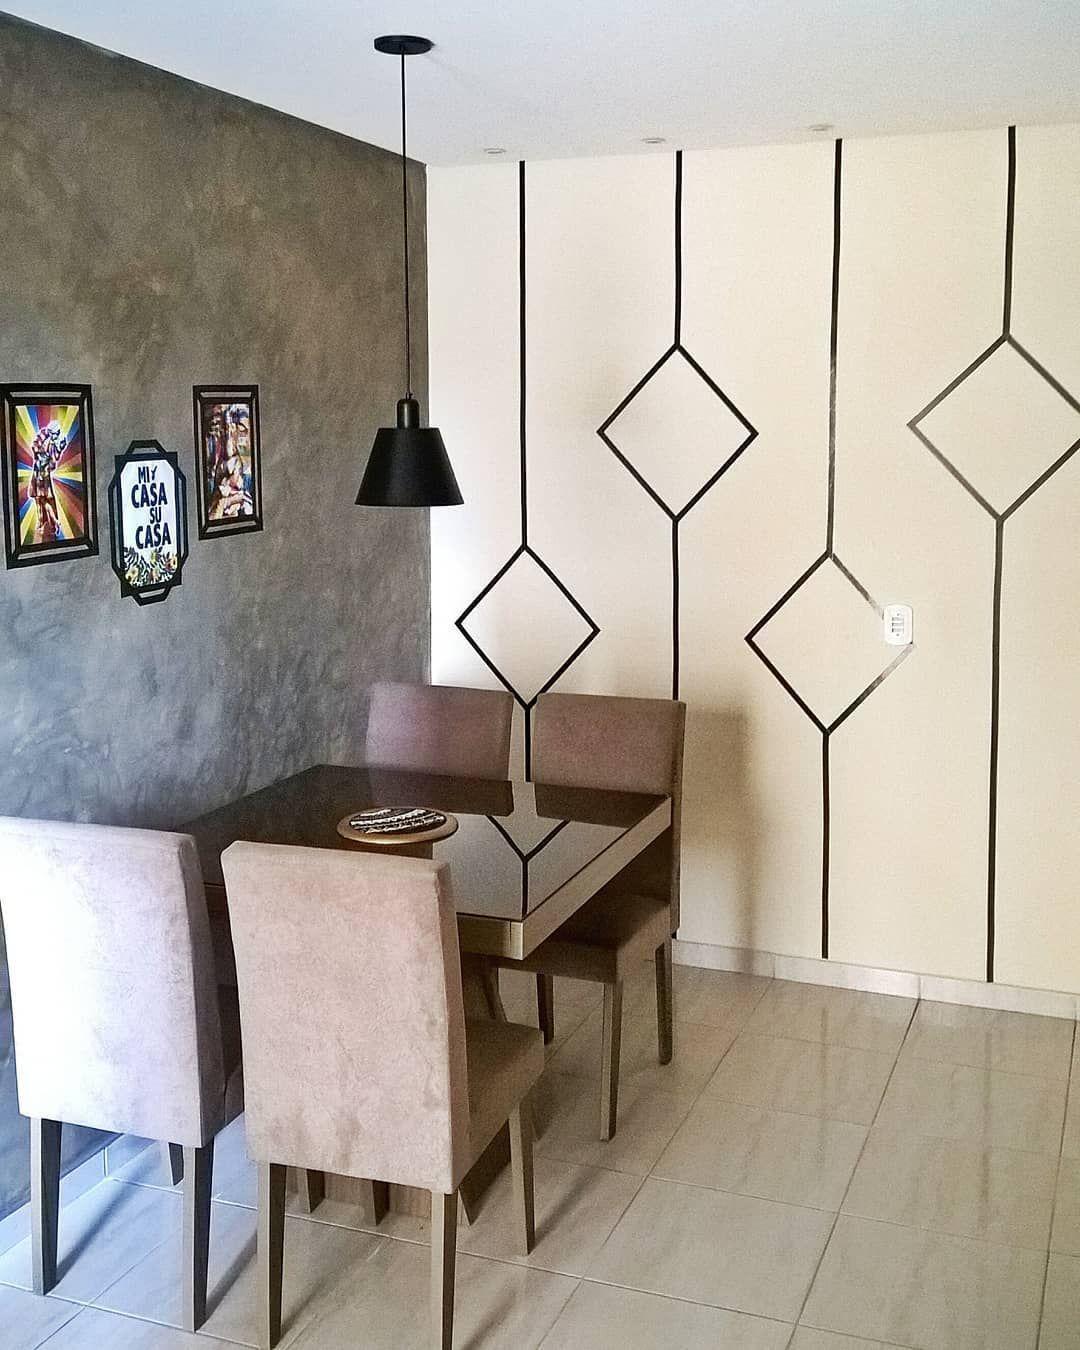 Decoracao Com Fita Isolante 100 Inspiracoes Para Fazer Ja 321866704620787152 Bedroom Wall Designs Bedroom Wall Paint Decor